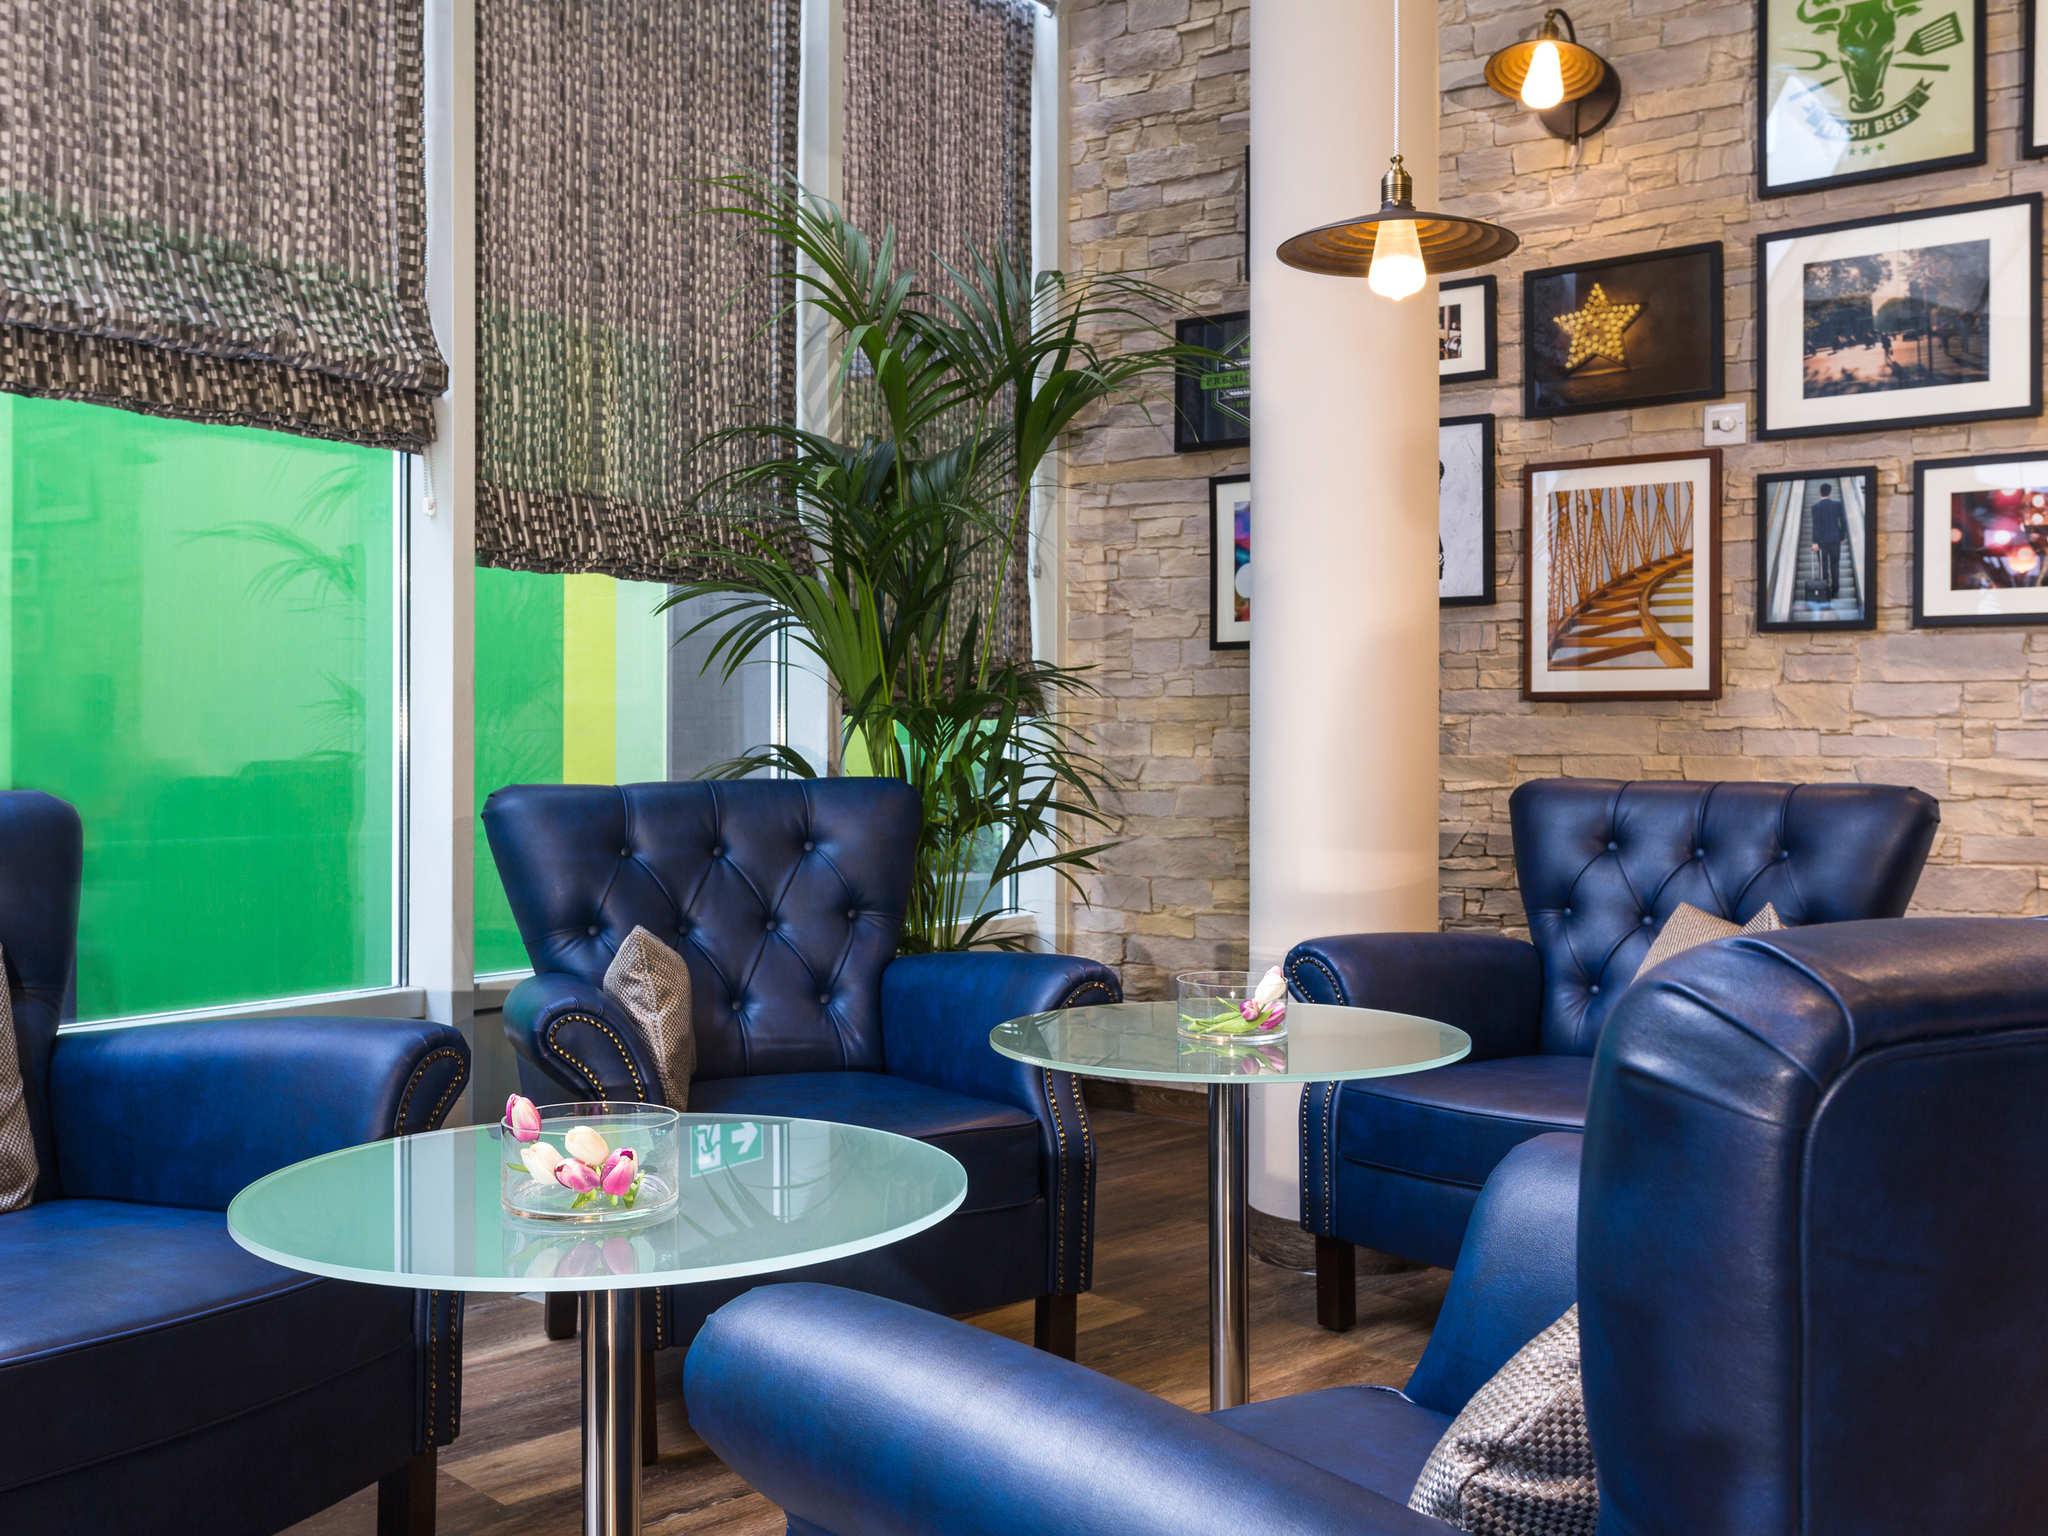 Hotel ibis Styles Stuttgart Book now Free Wifi Fitness room